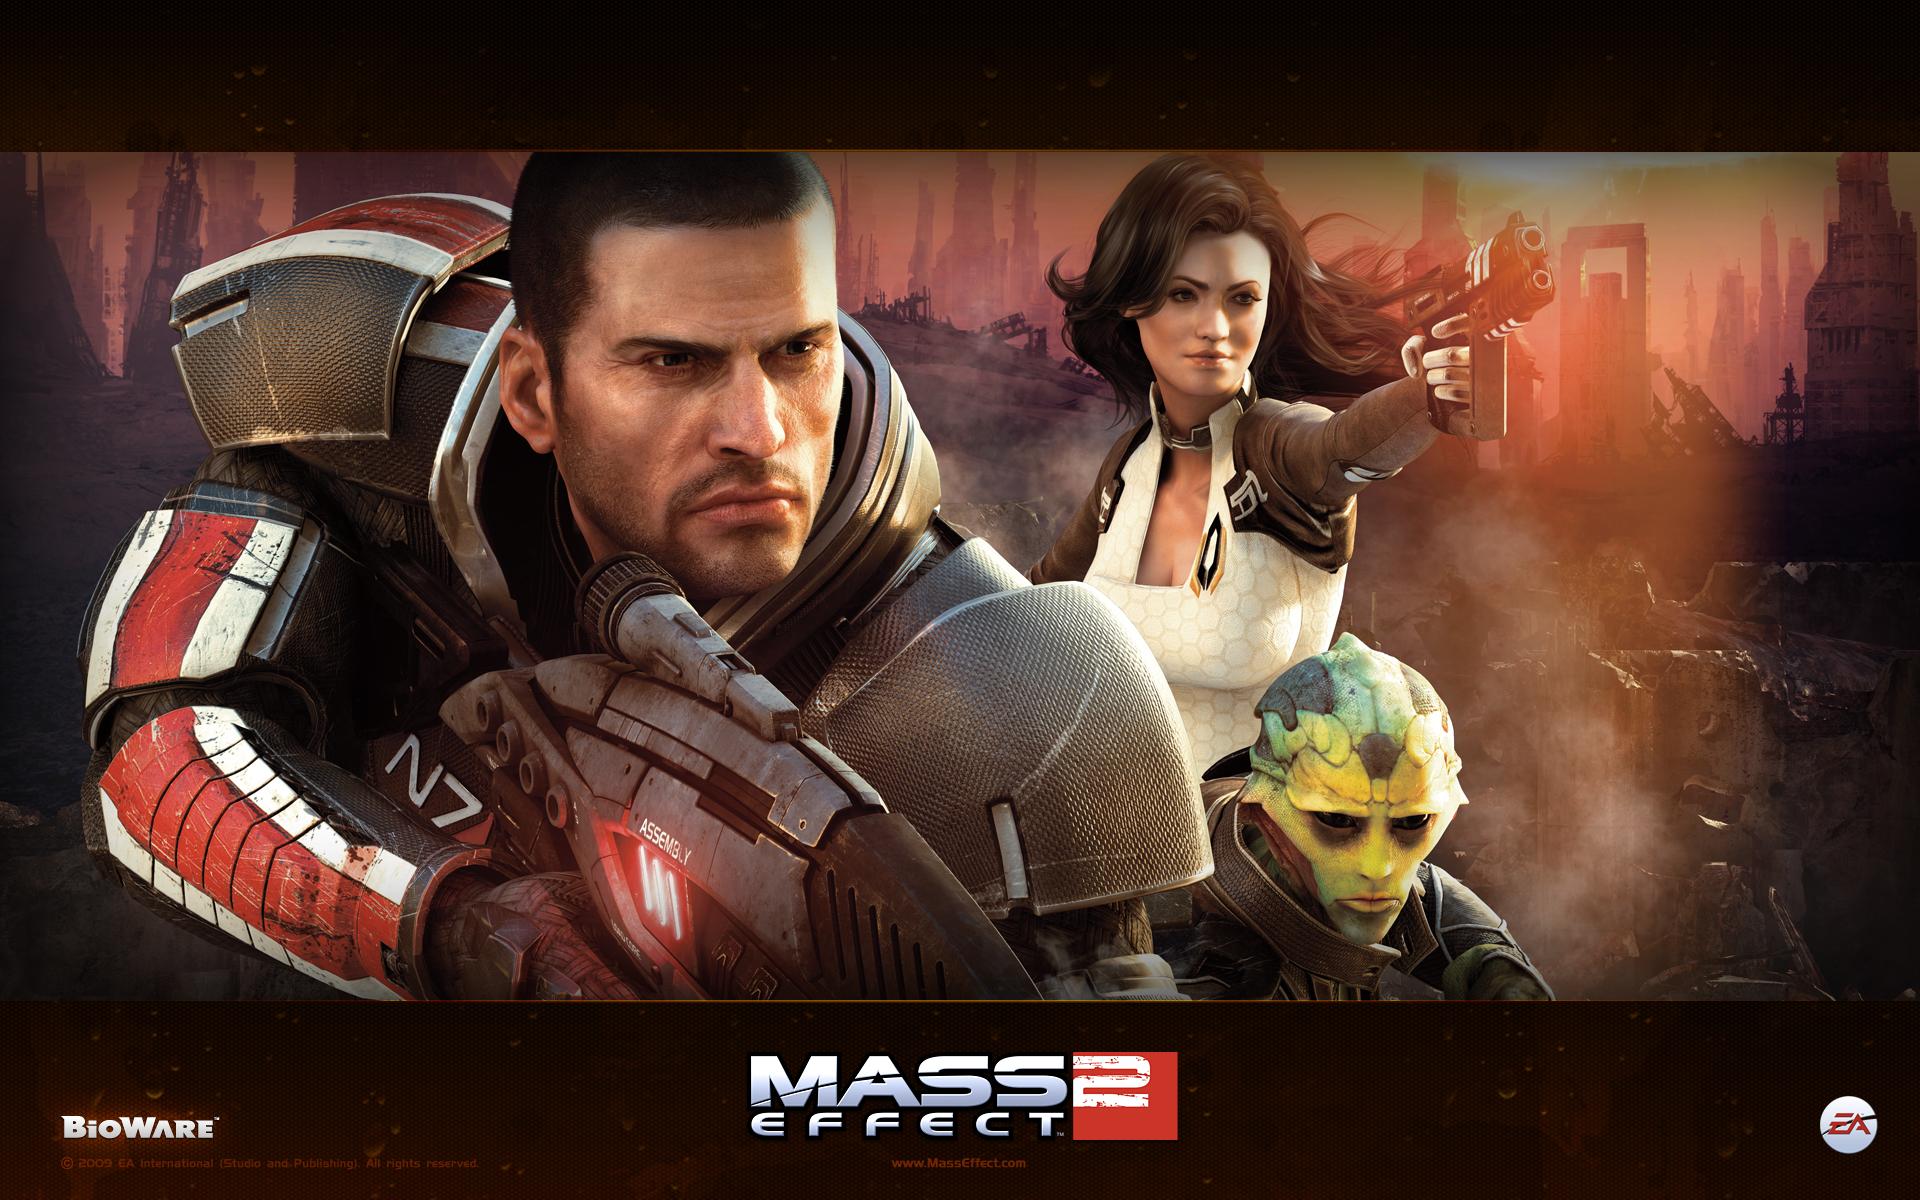 Арт к игре Mass Effect 2